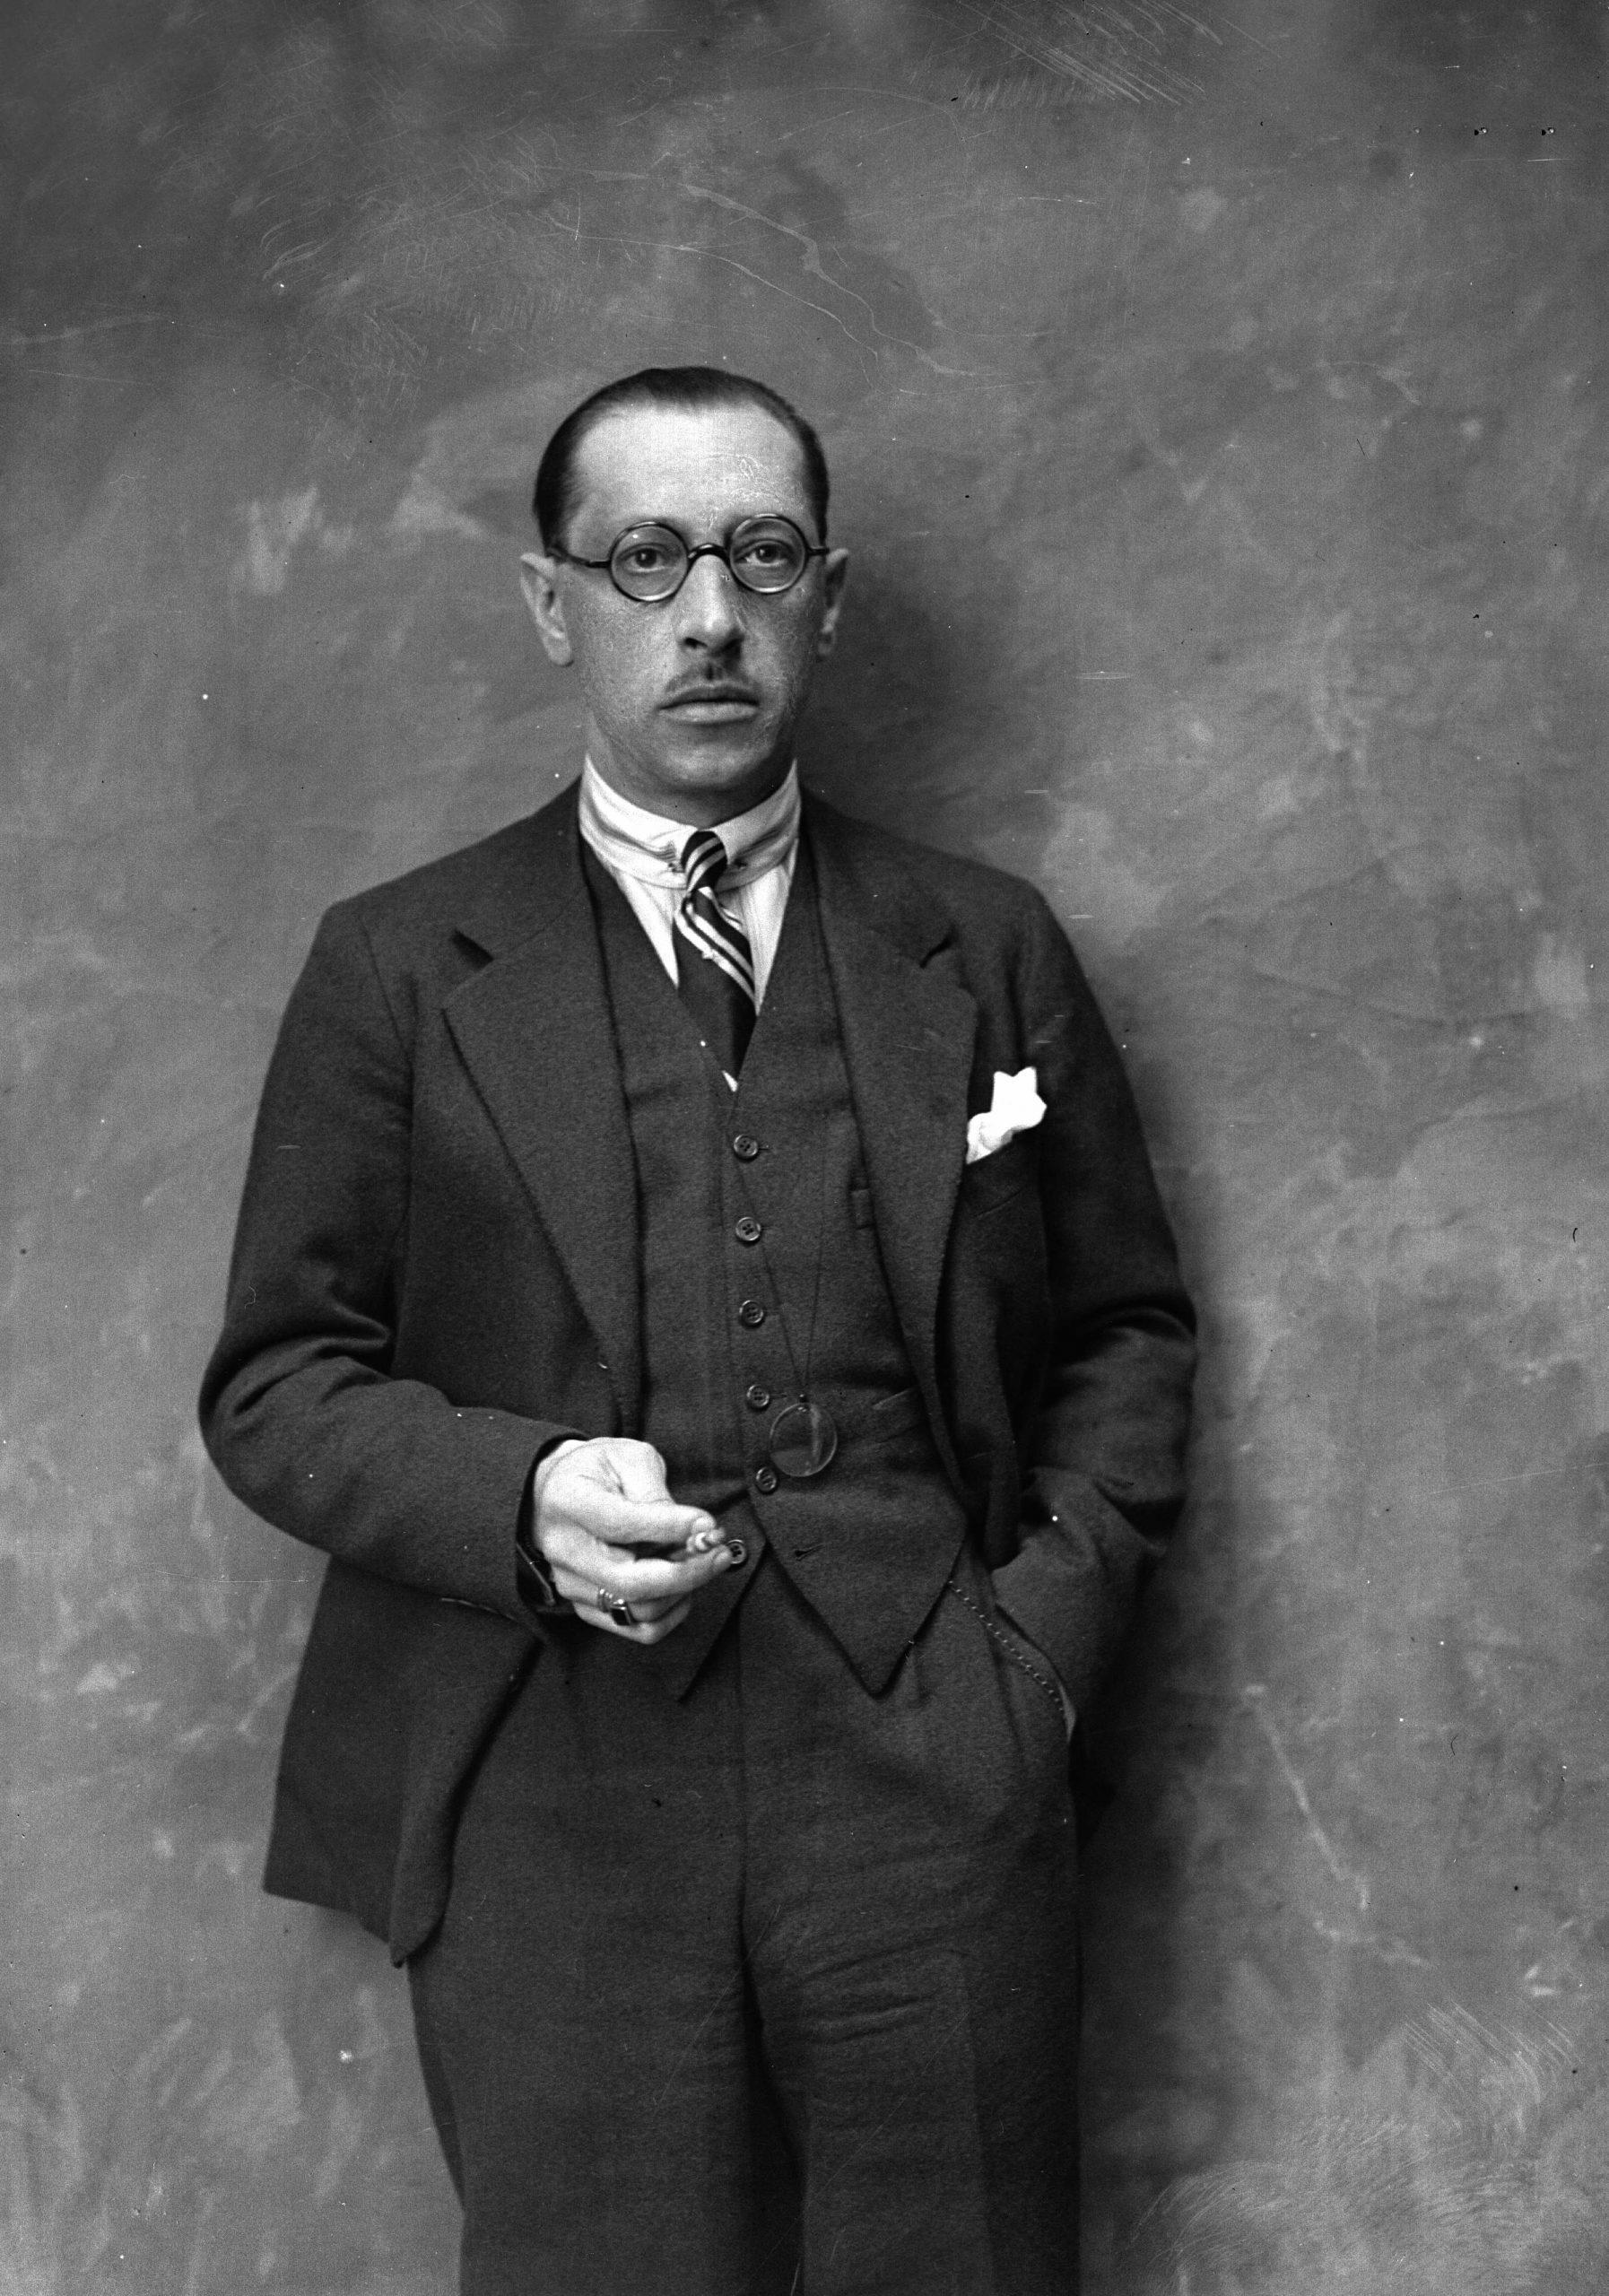 Portrait of Igor Stravinski, composer from Russian